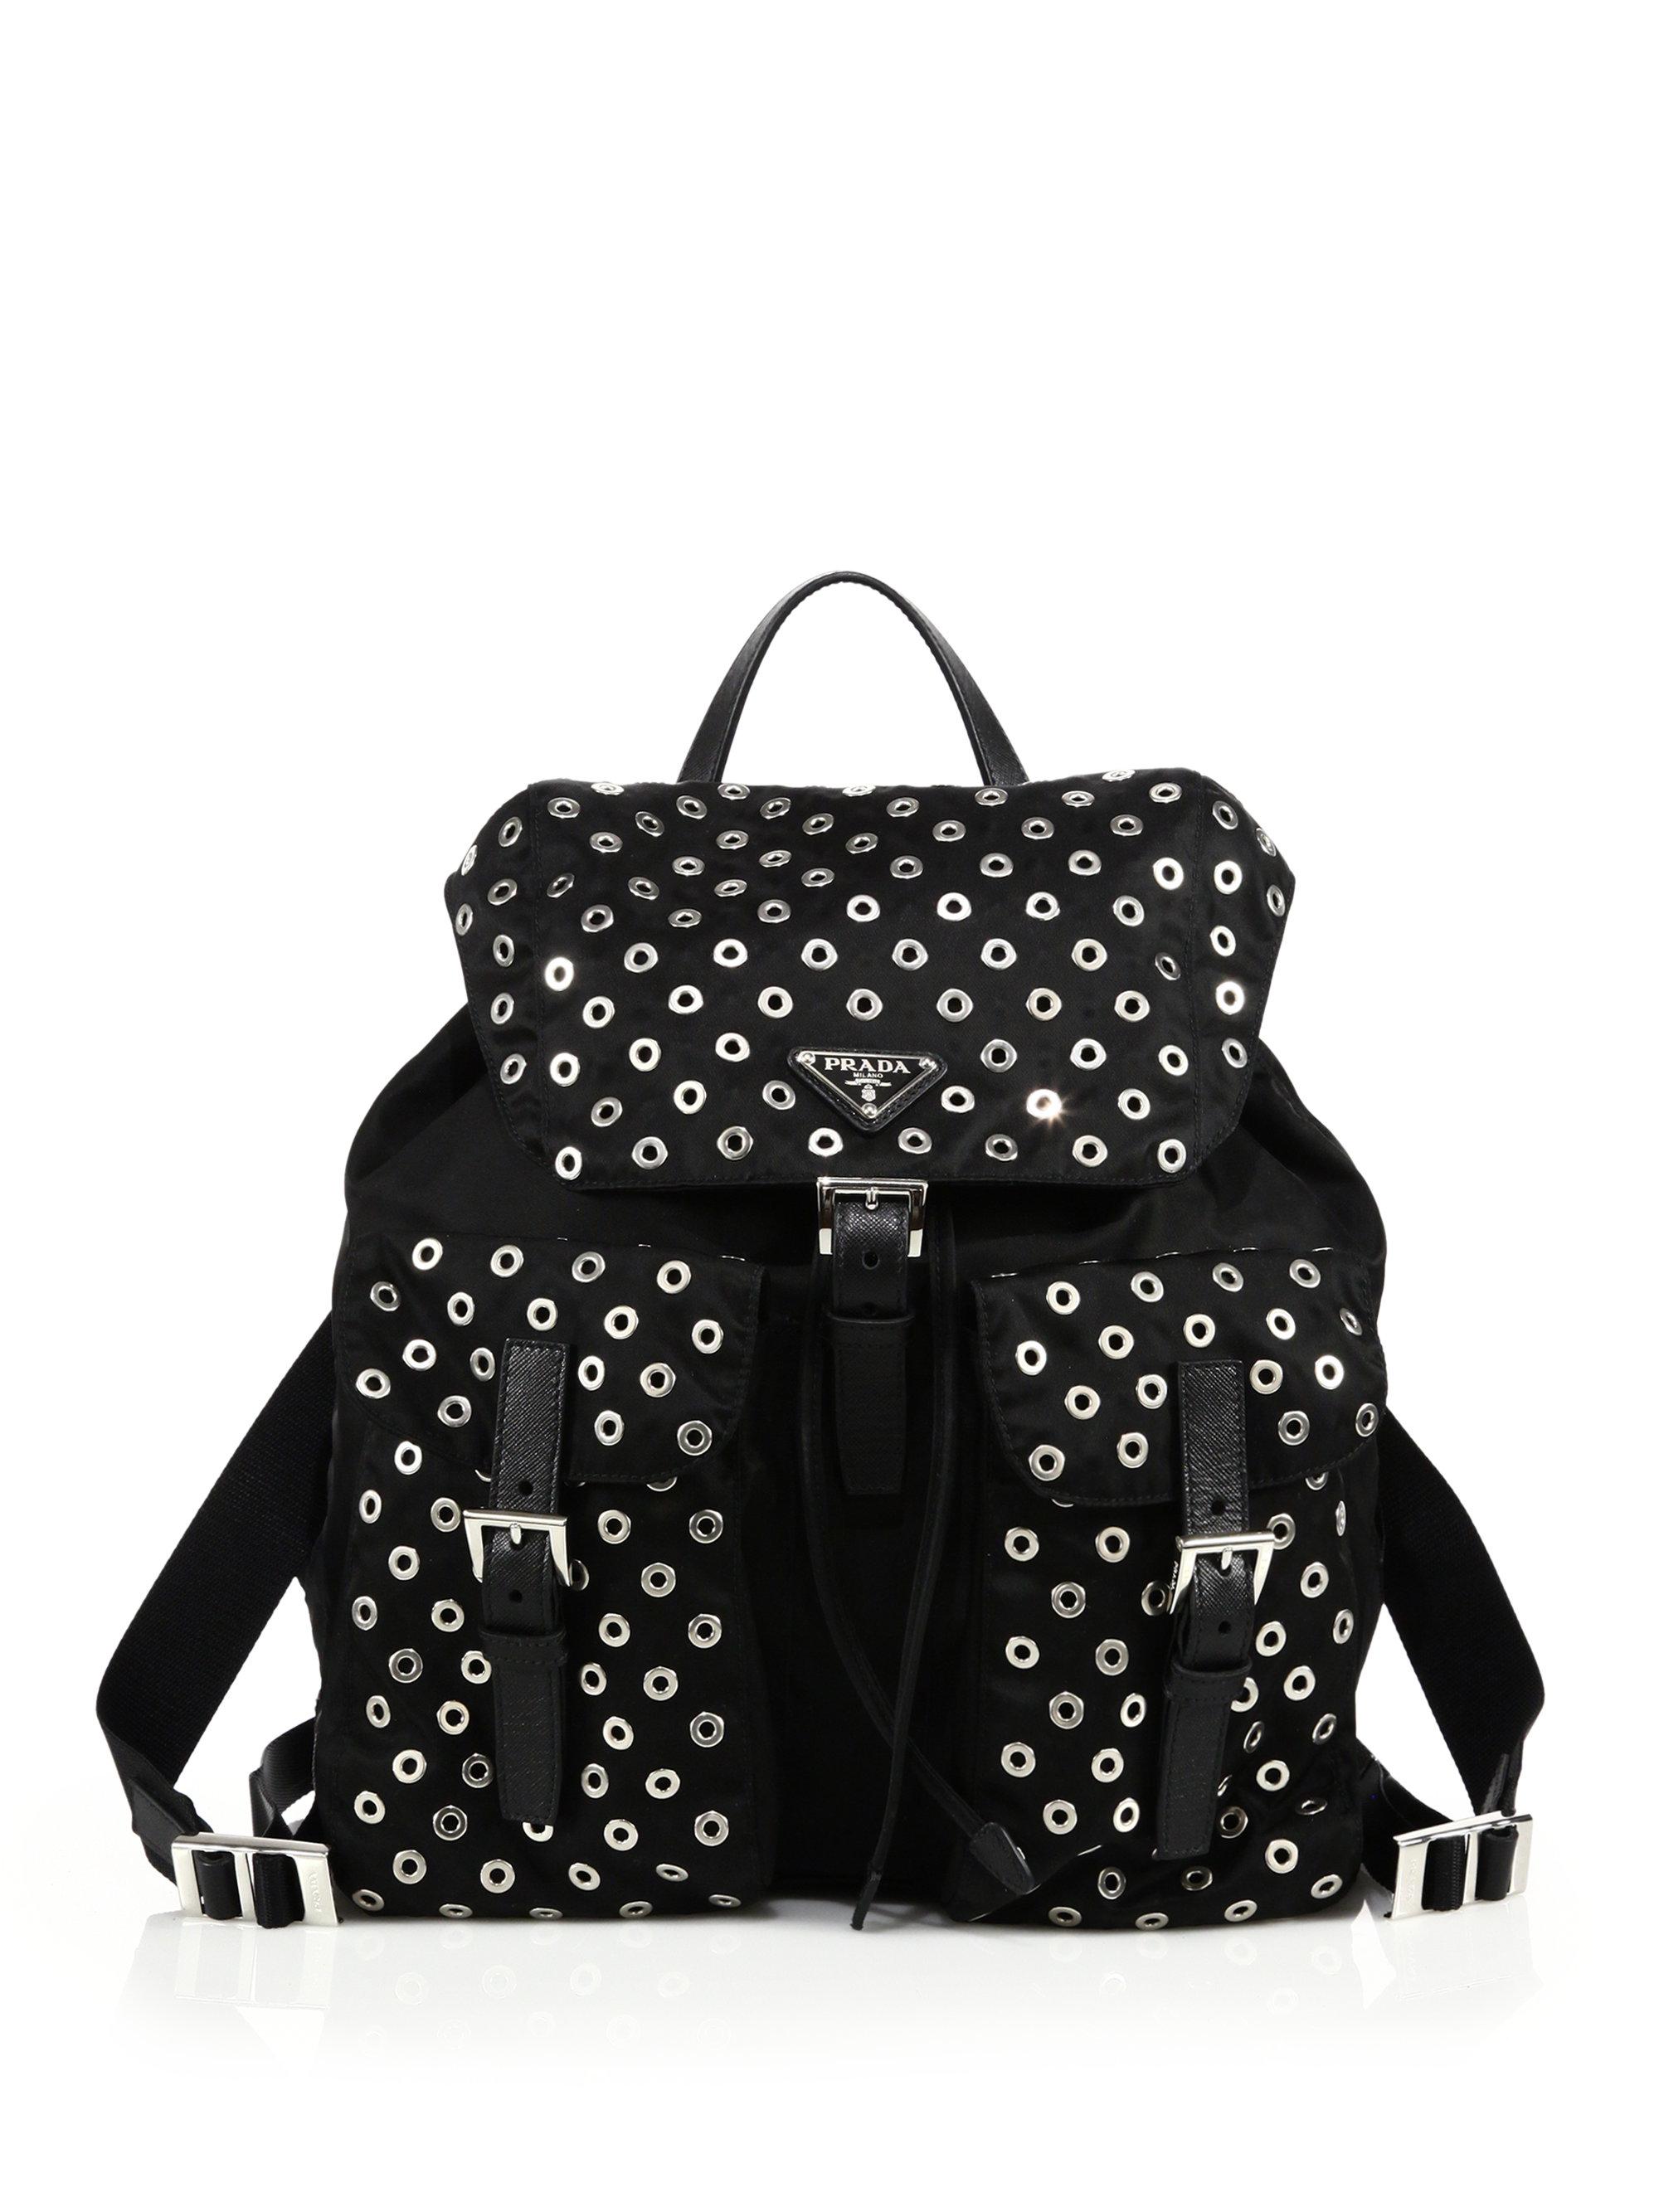 202a116dbc3b ... spain lyst prada grommeted nylon backpack in black d9b99 645cc